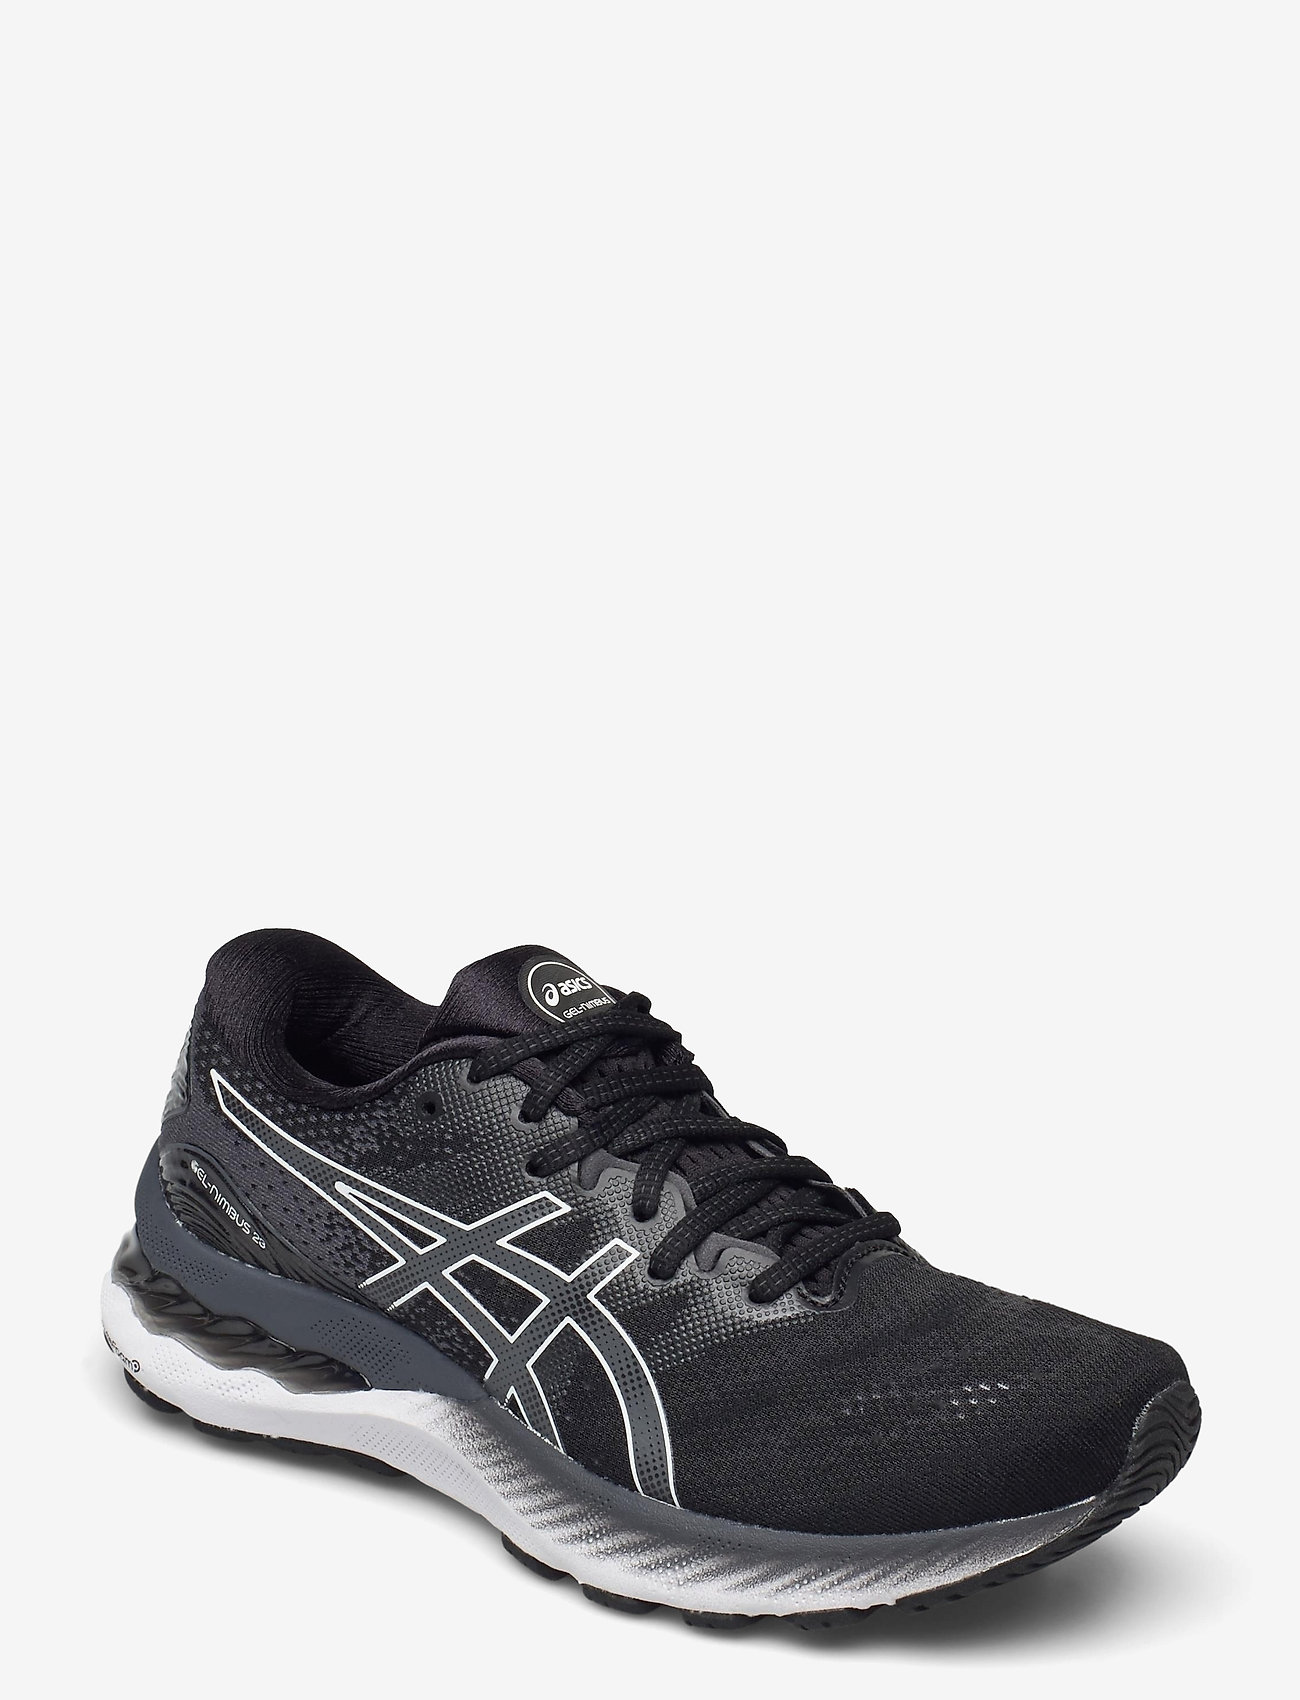 Asics - GEL-NIMBUS 23 - running shoes - black/white - 0